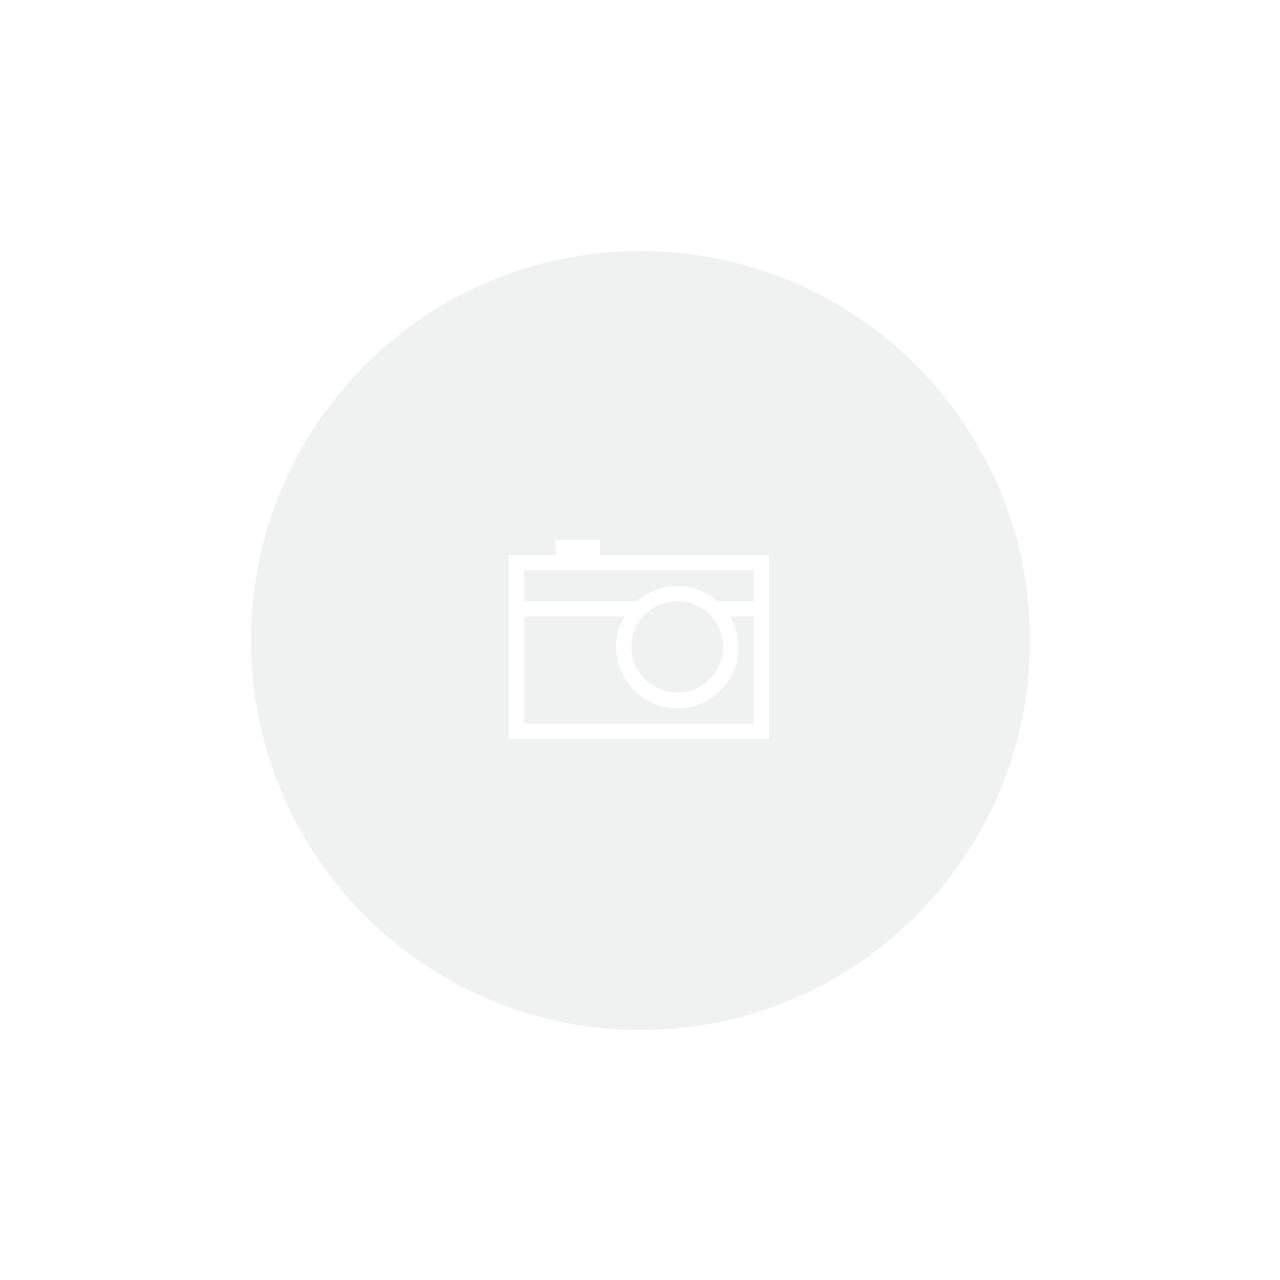 Nobreak NHS Premium PDV XXXX-Y(GII 600VA E-C/1Bat.45ah Etac)